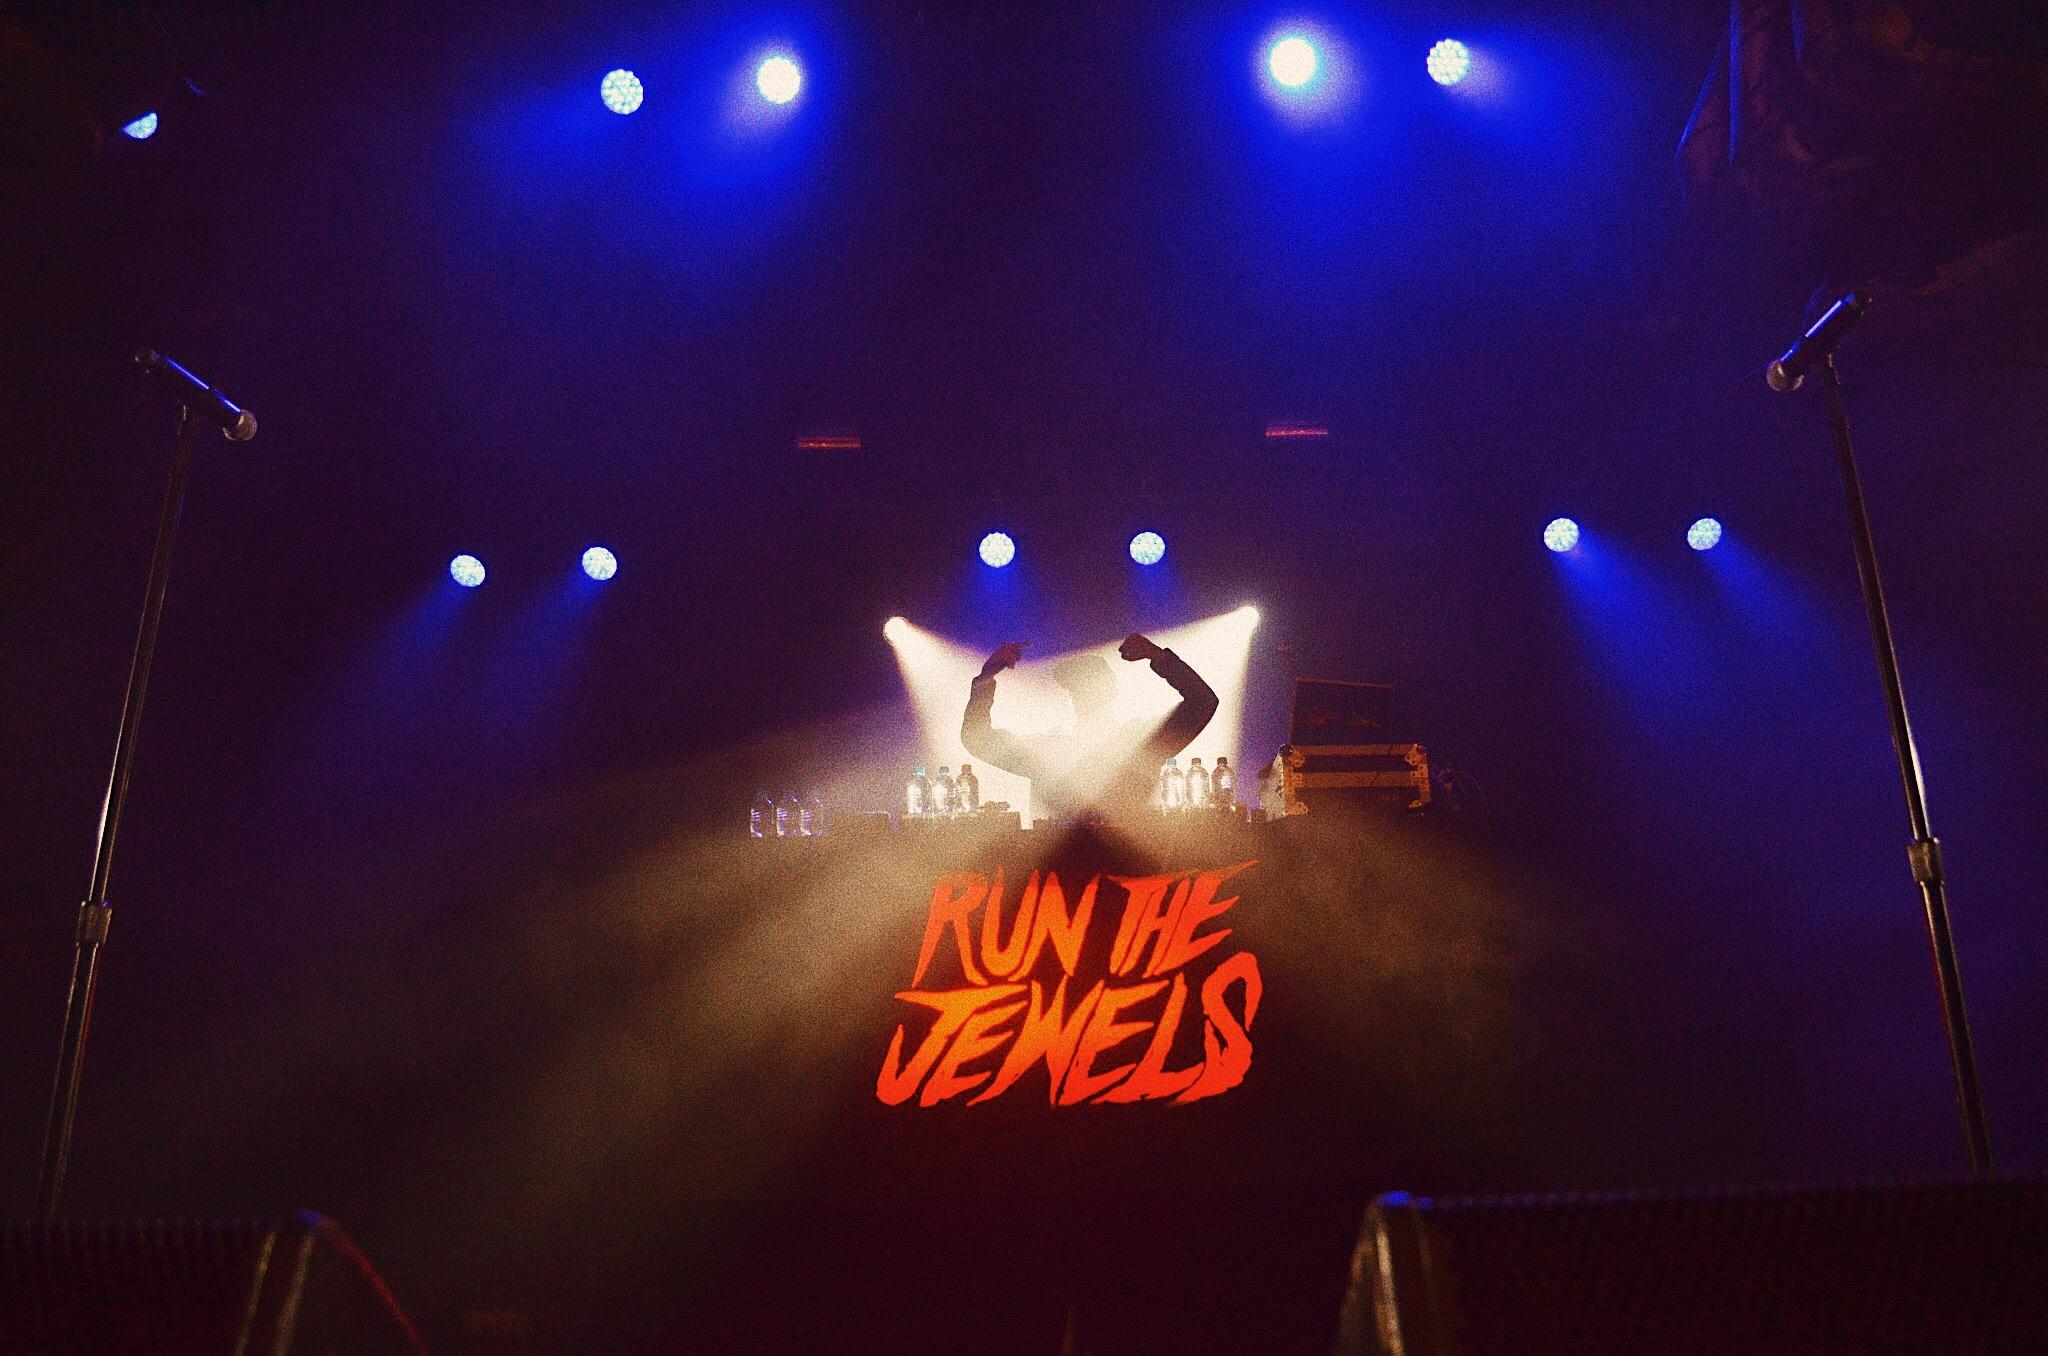 live review melbourne run the jewels photo credit ryley clarke savage thrills savagethrills 2